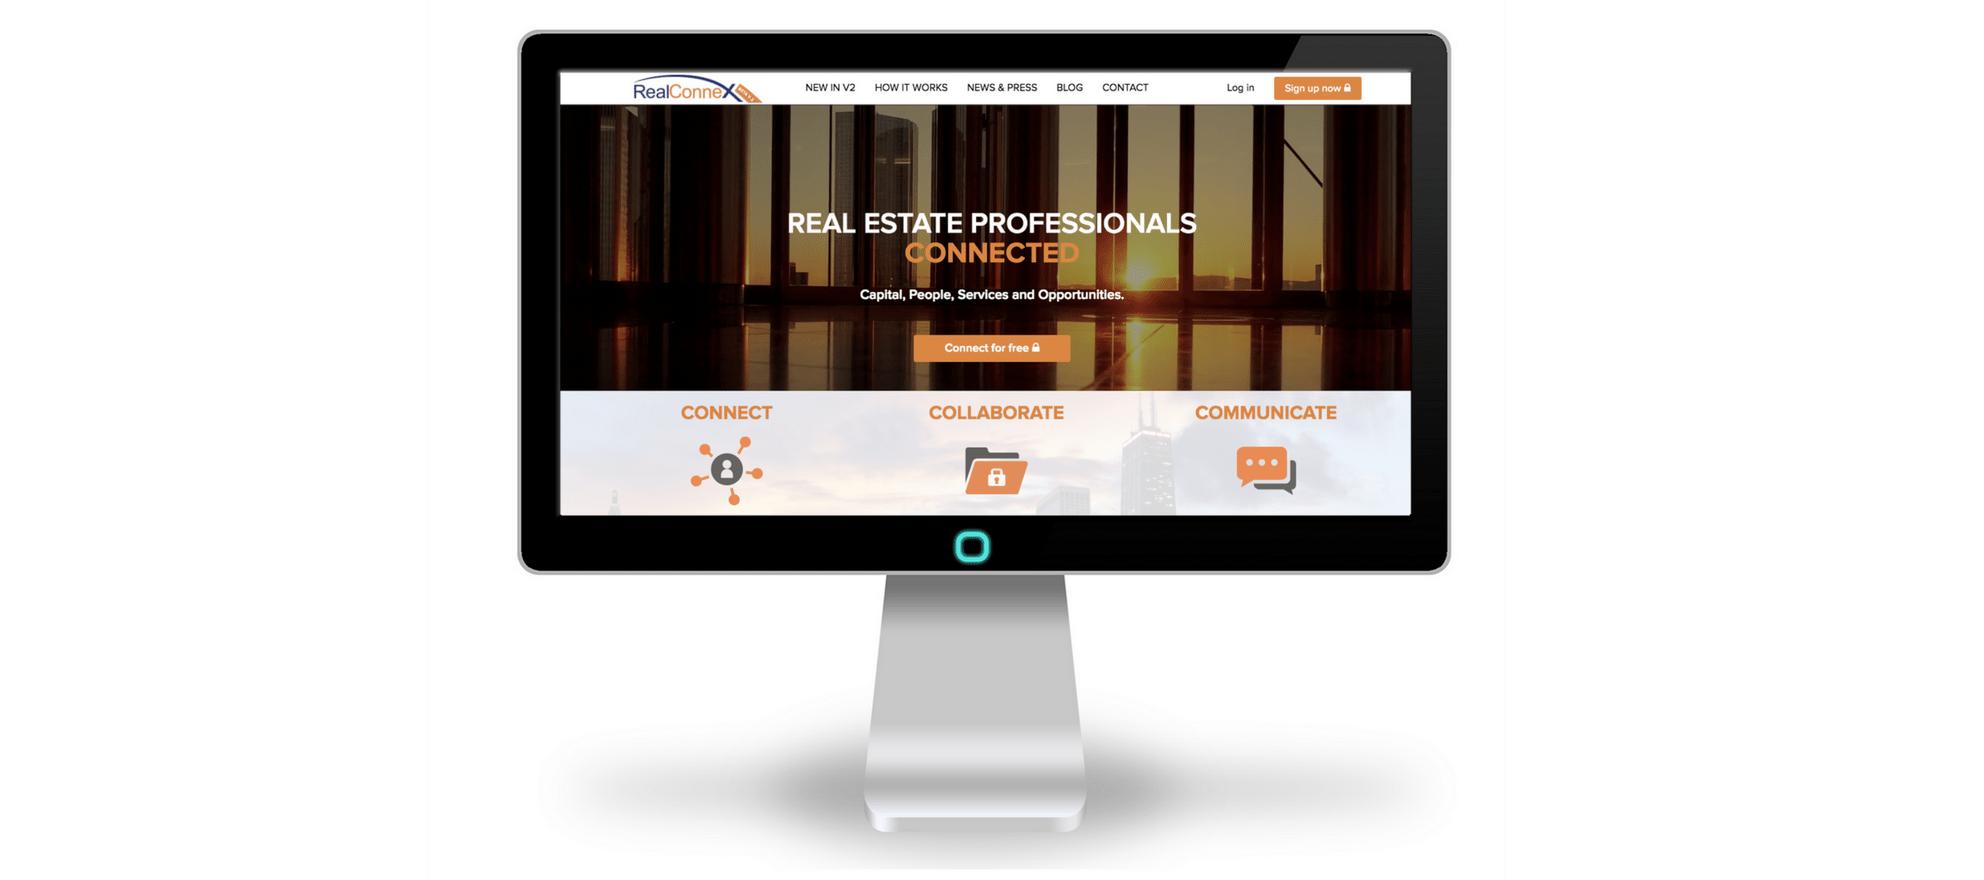 miami association of realtors realconnex partnership